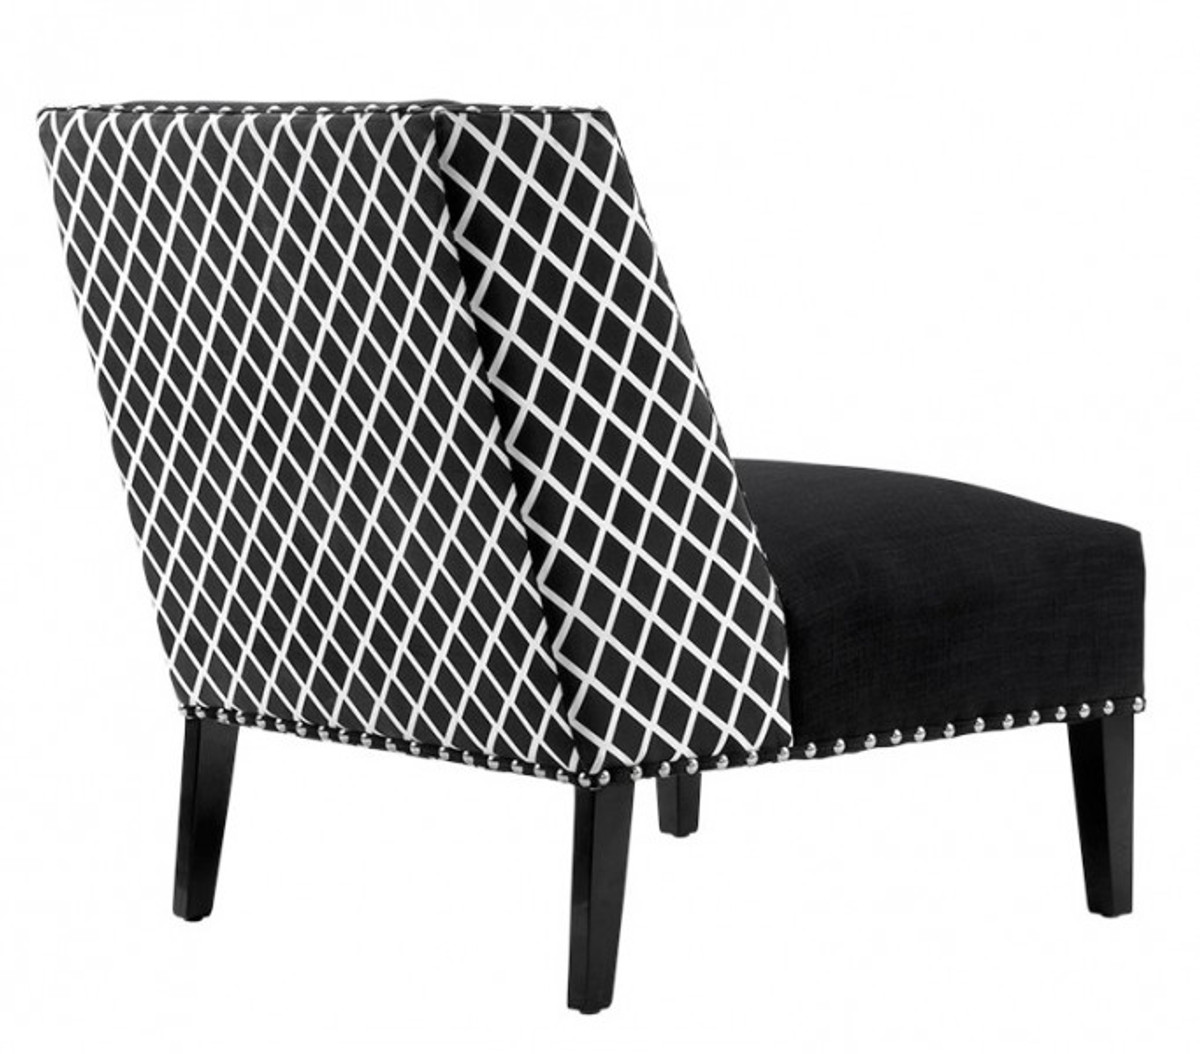 Casa Padrino Luxus Art Deco Sessel Schwarz Weiß Jugendstil Belle